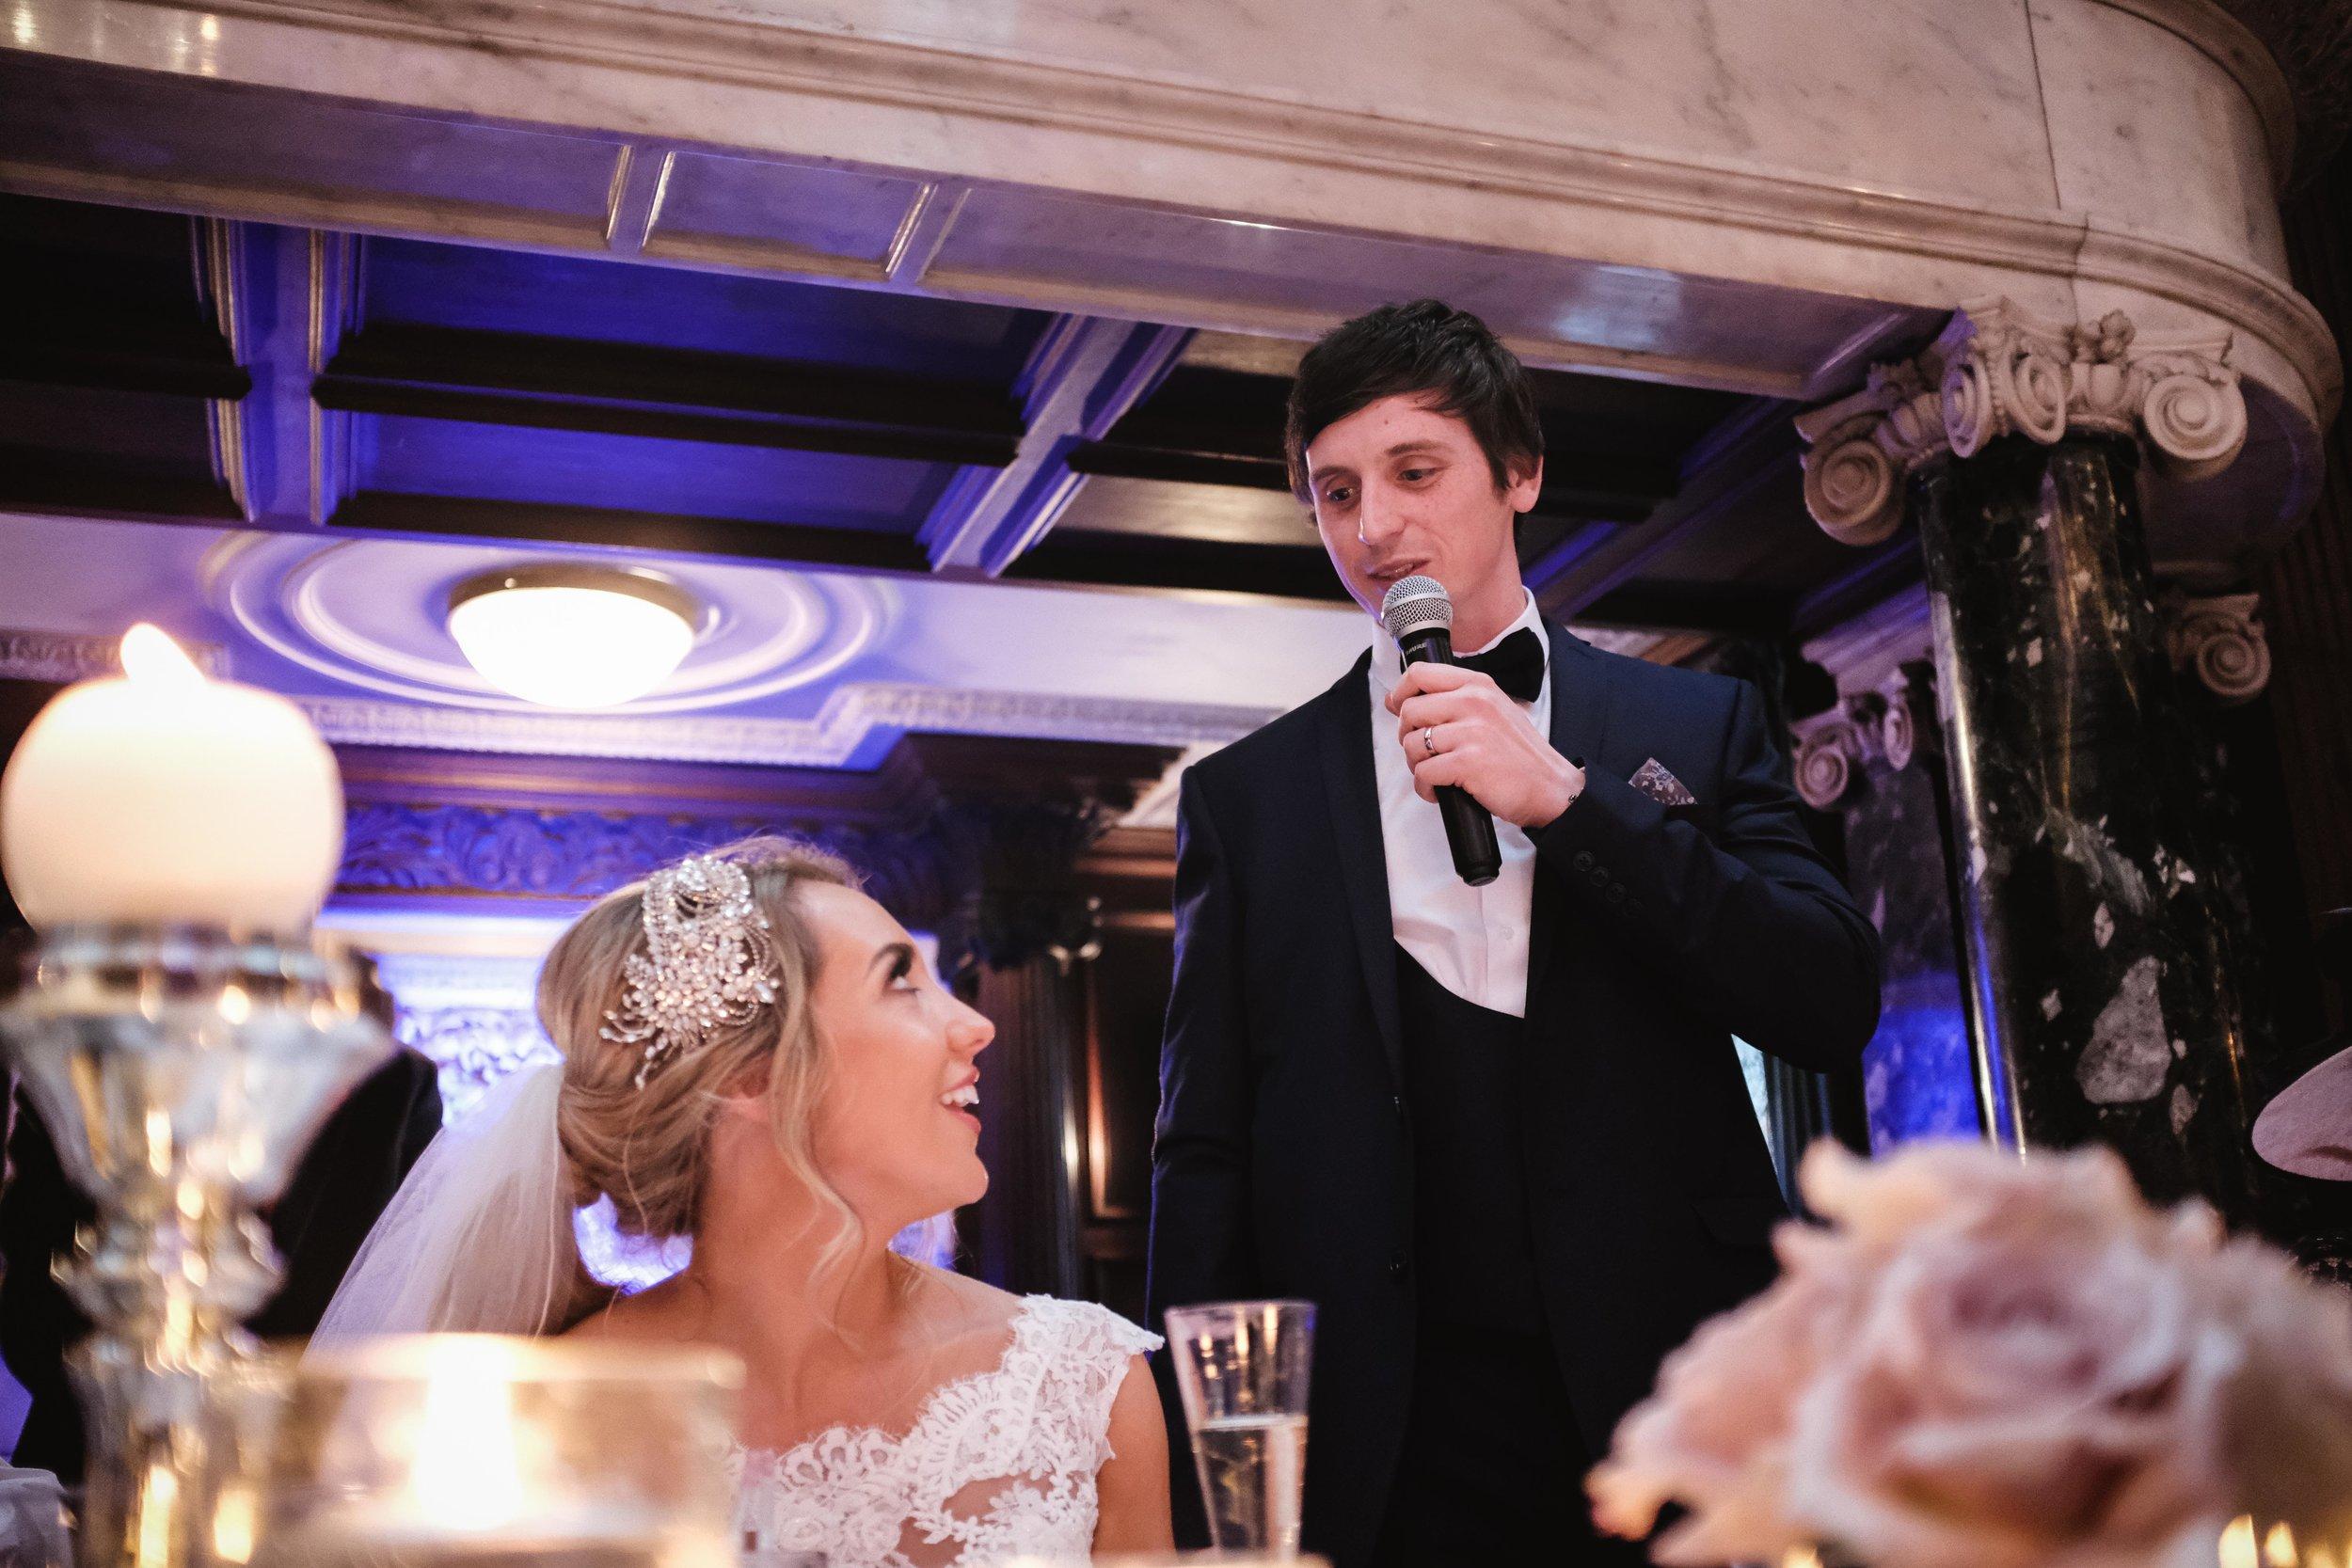 Thornton manor wedding photography cheshire wedding photographer liverpool manchester warrington chester wirral wedding BLOG (72 of 108).jpg